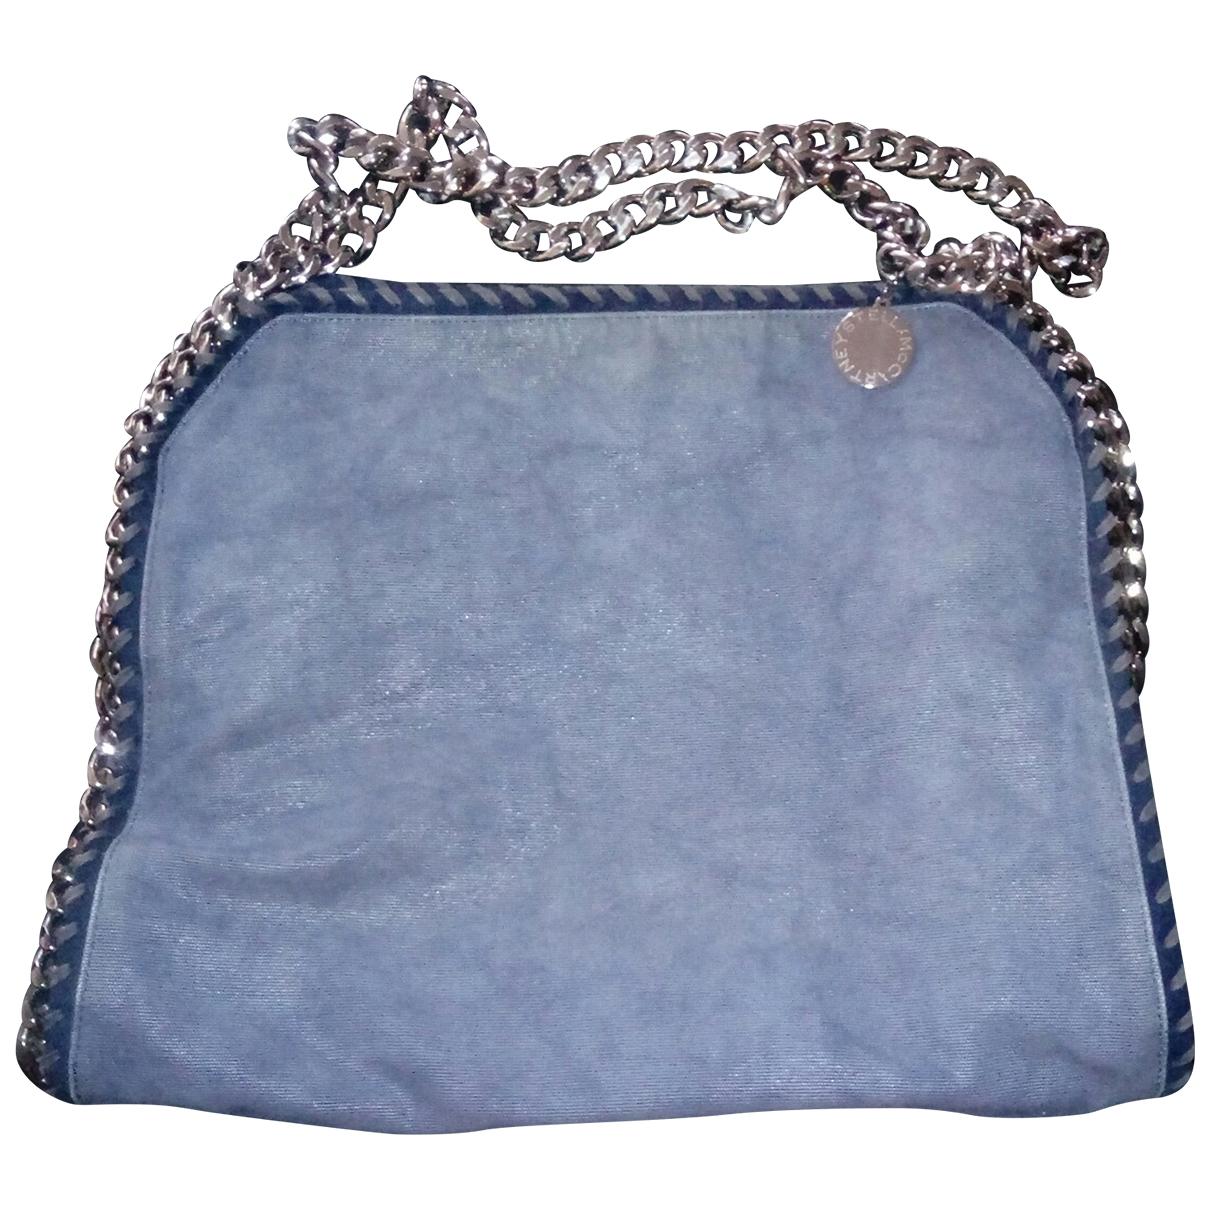 Stella Mccartney Falabella Denim - Jeans handbag for Women \N